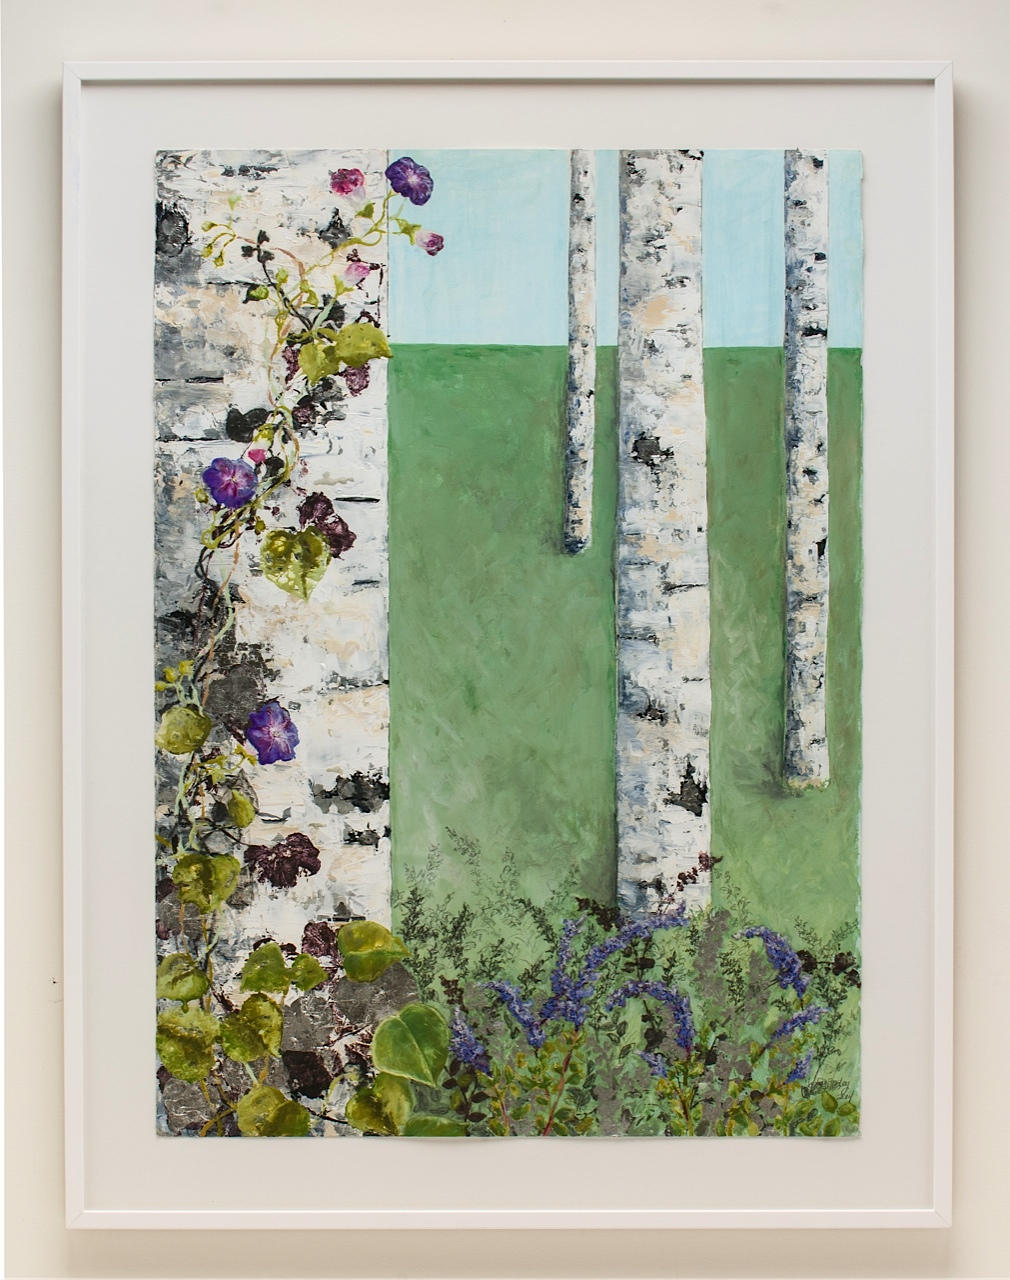 Edge of Meadow (2014)